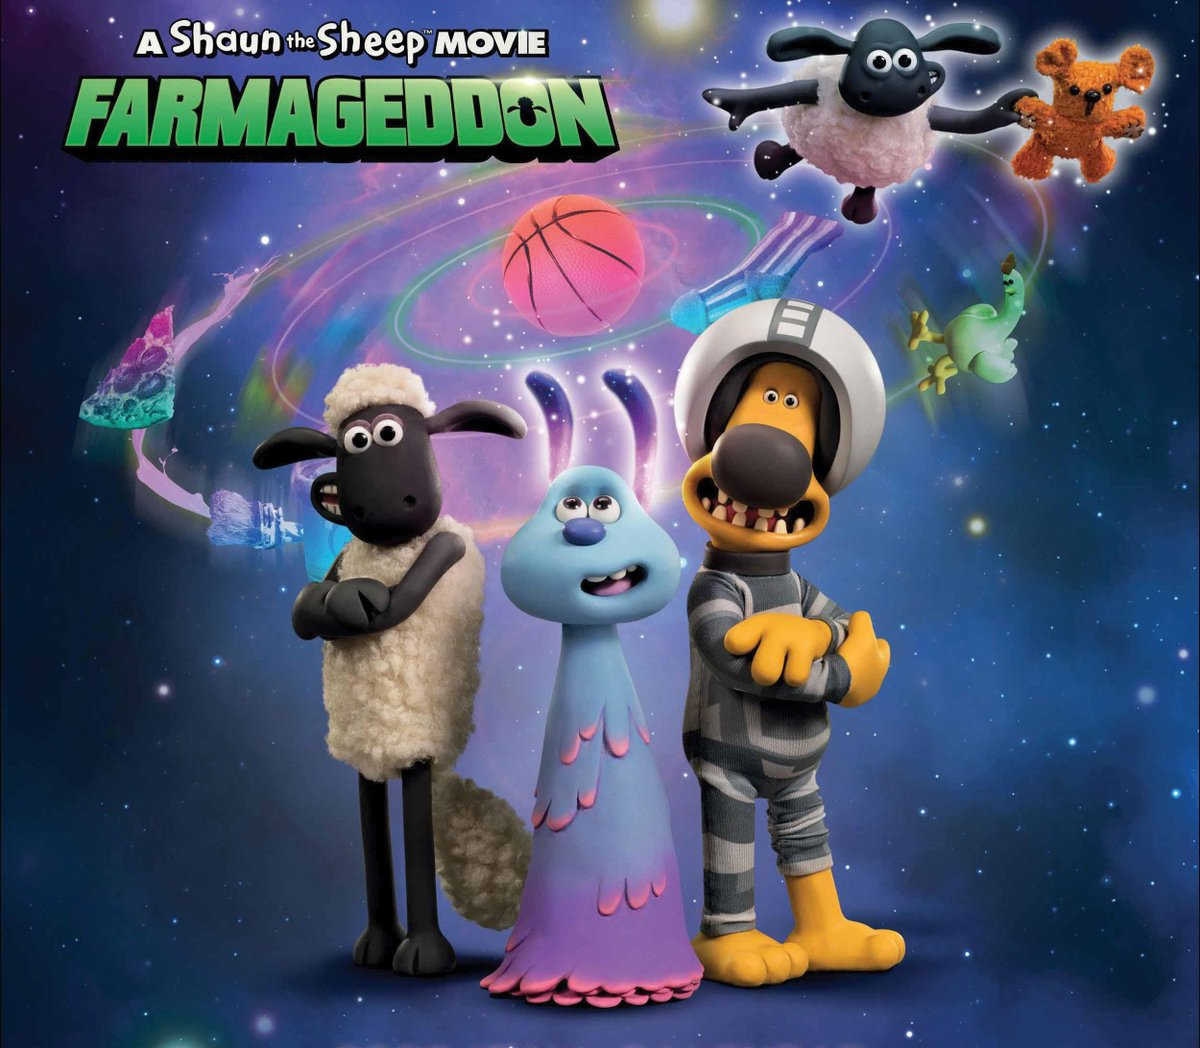 Animation Cartoon Full Movie a shaun the sheep movie: farmageddon free 123movie